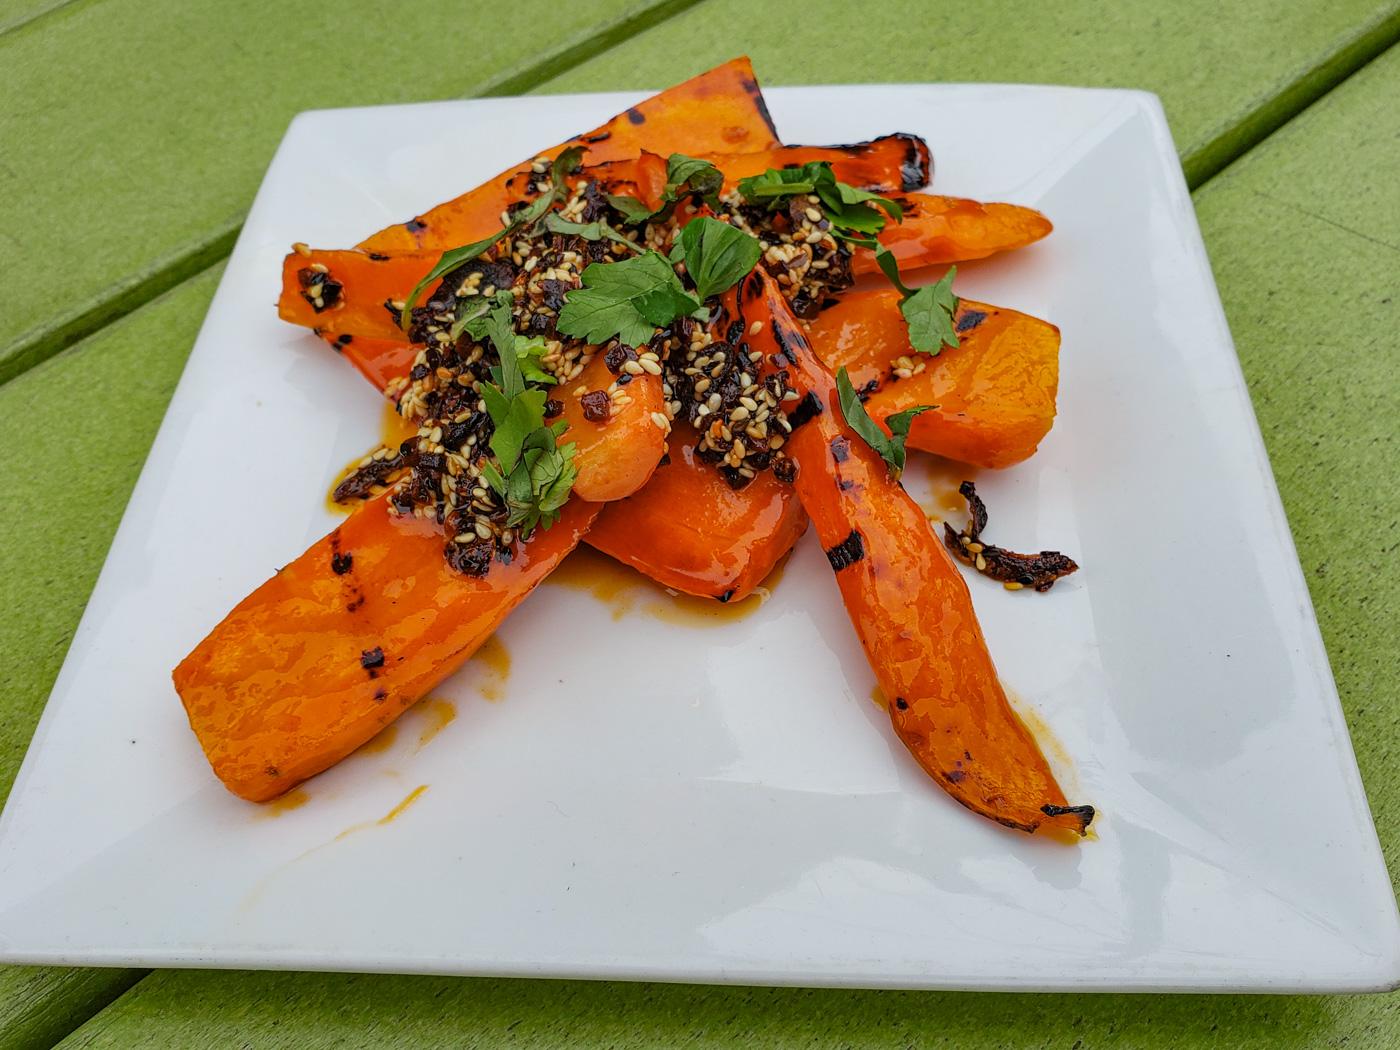 Chili Crisp Carrots at American Sardine Bar